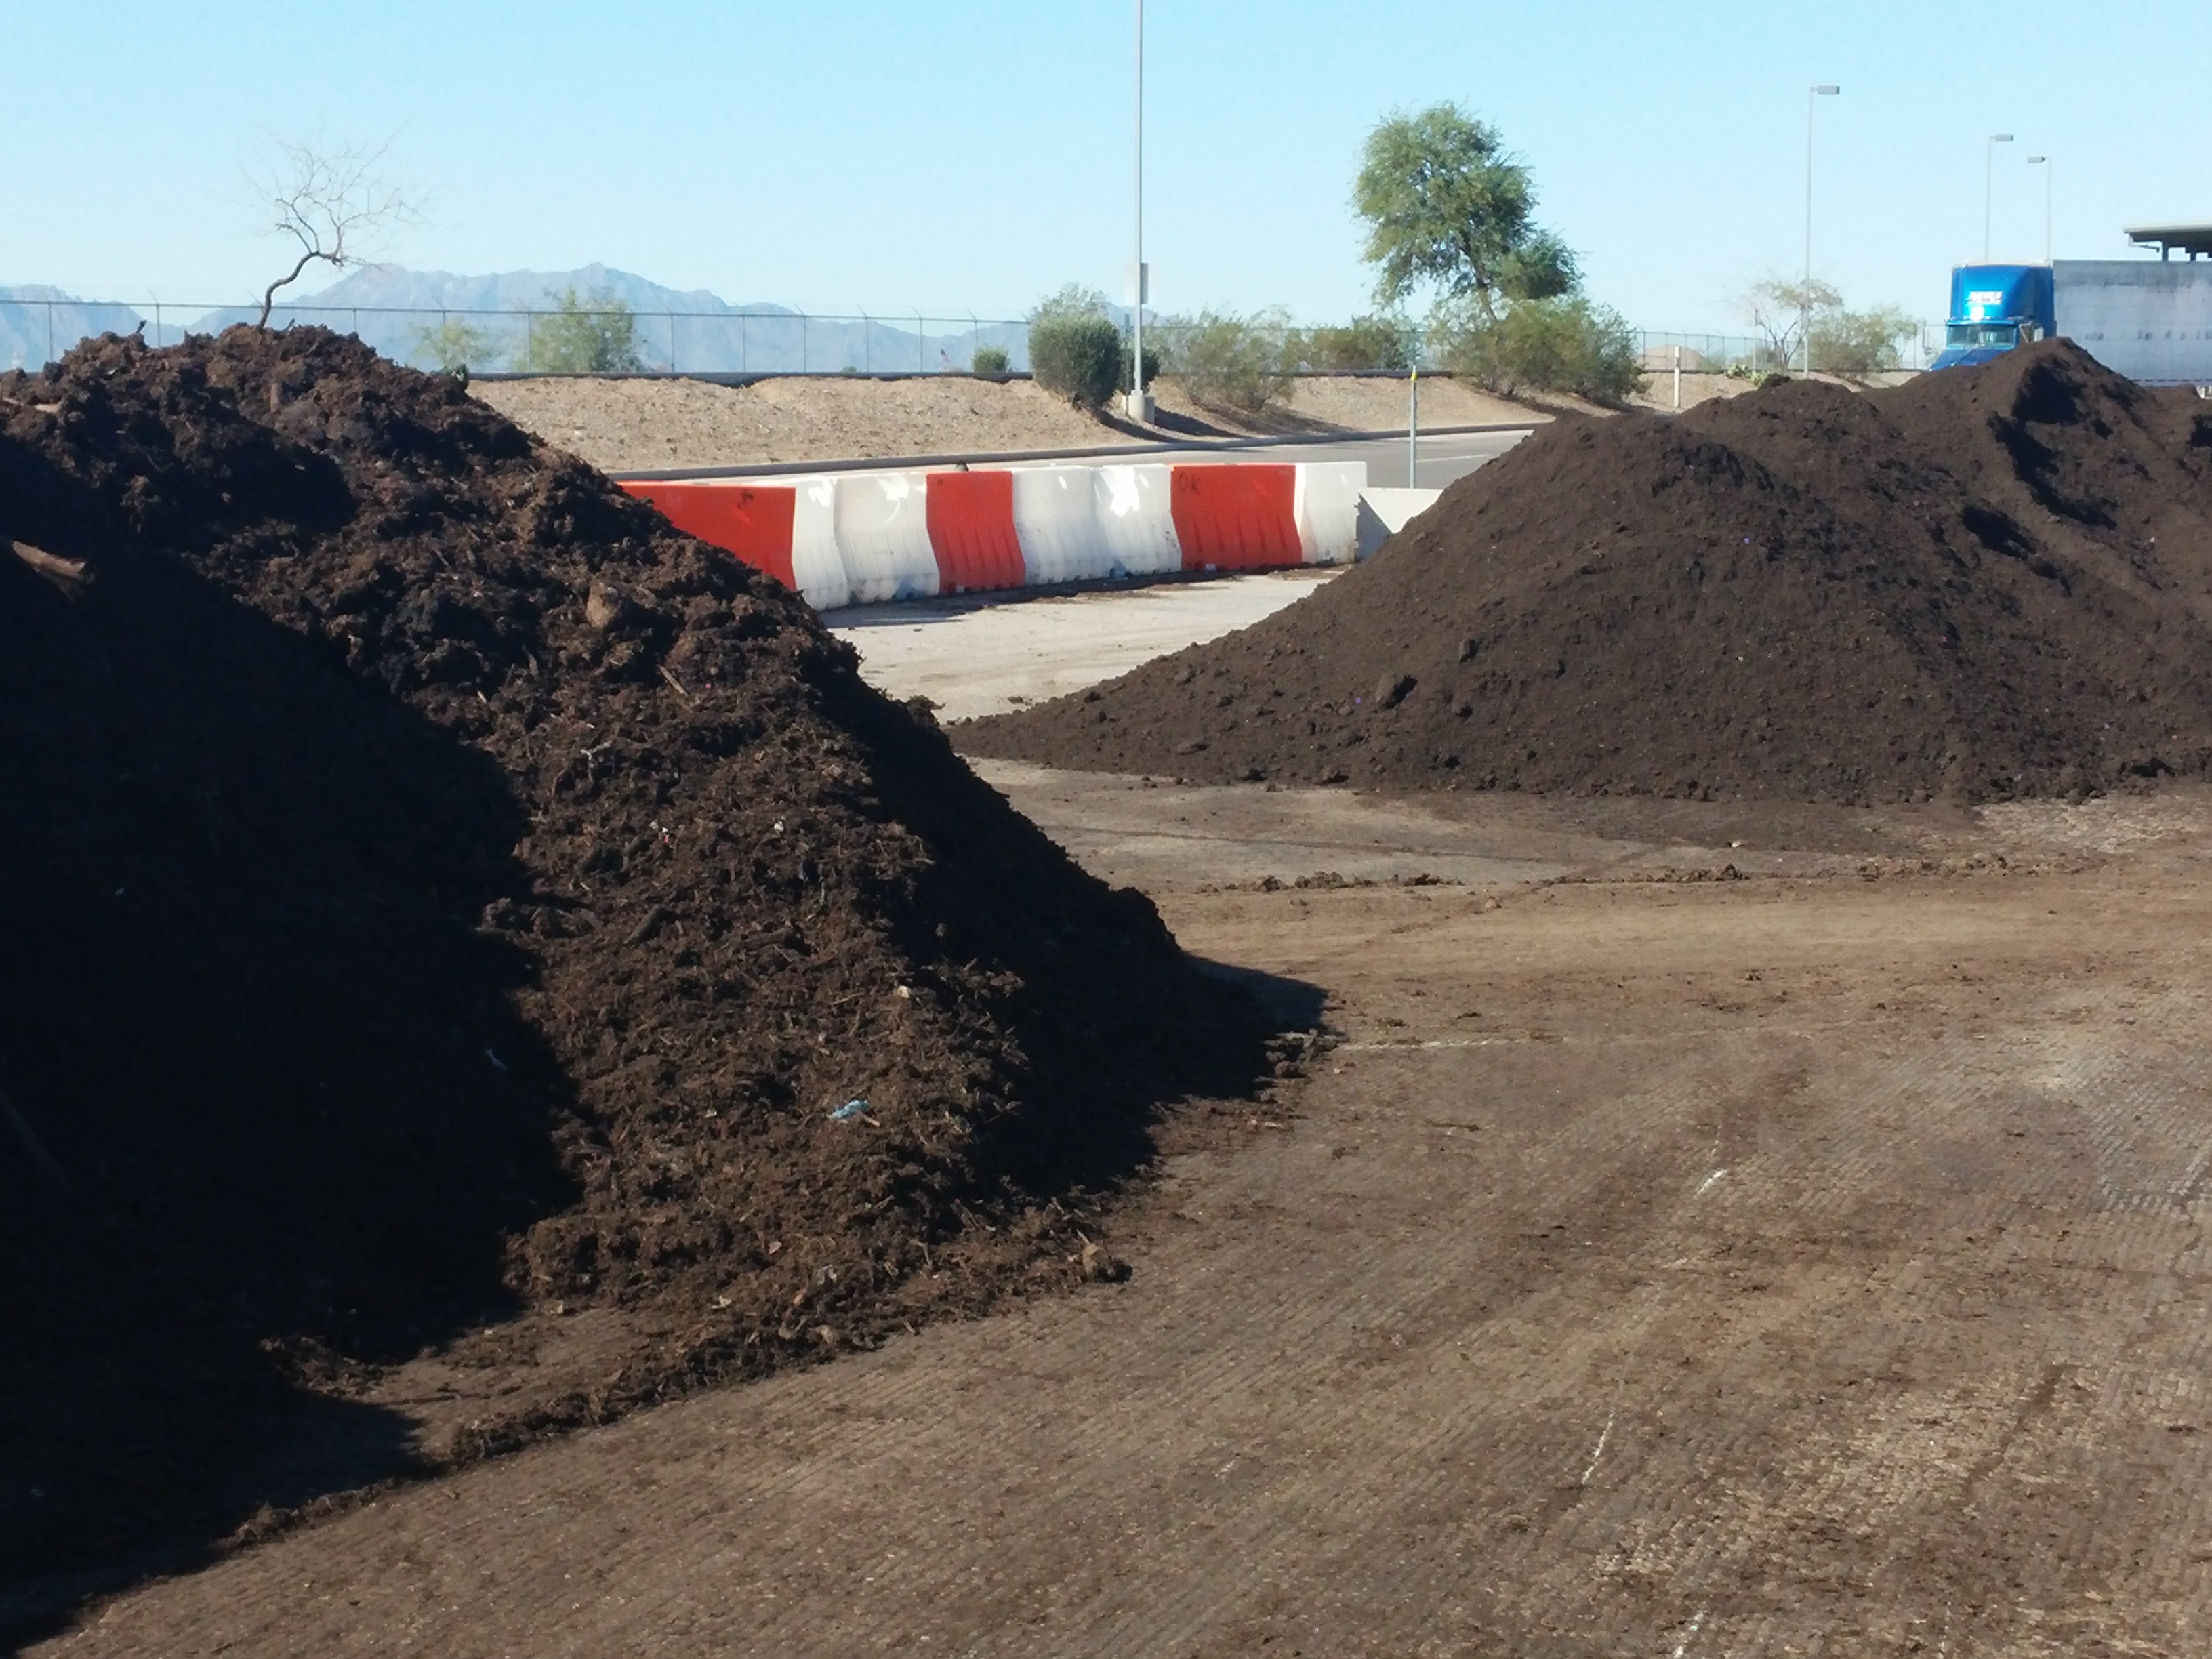 compost, food, waste, soil